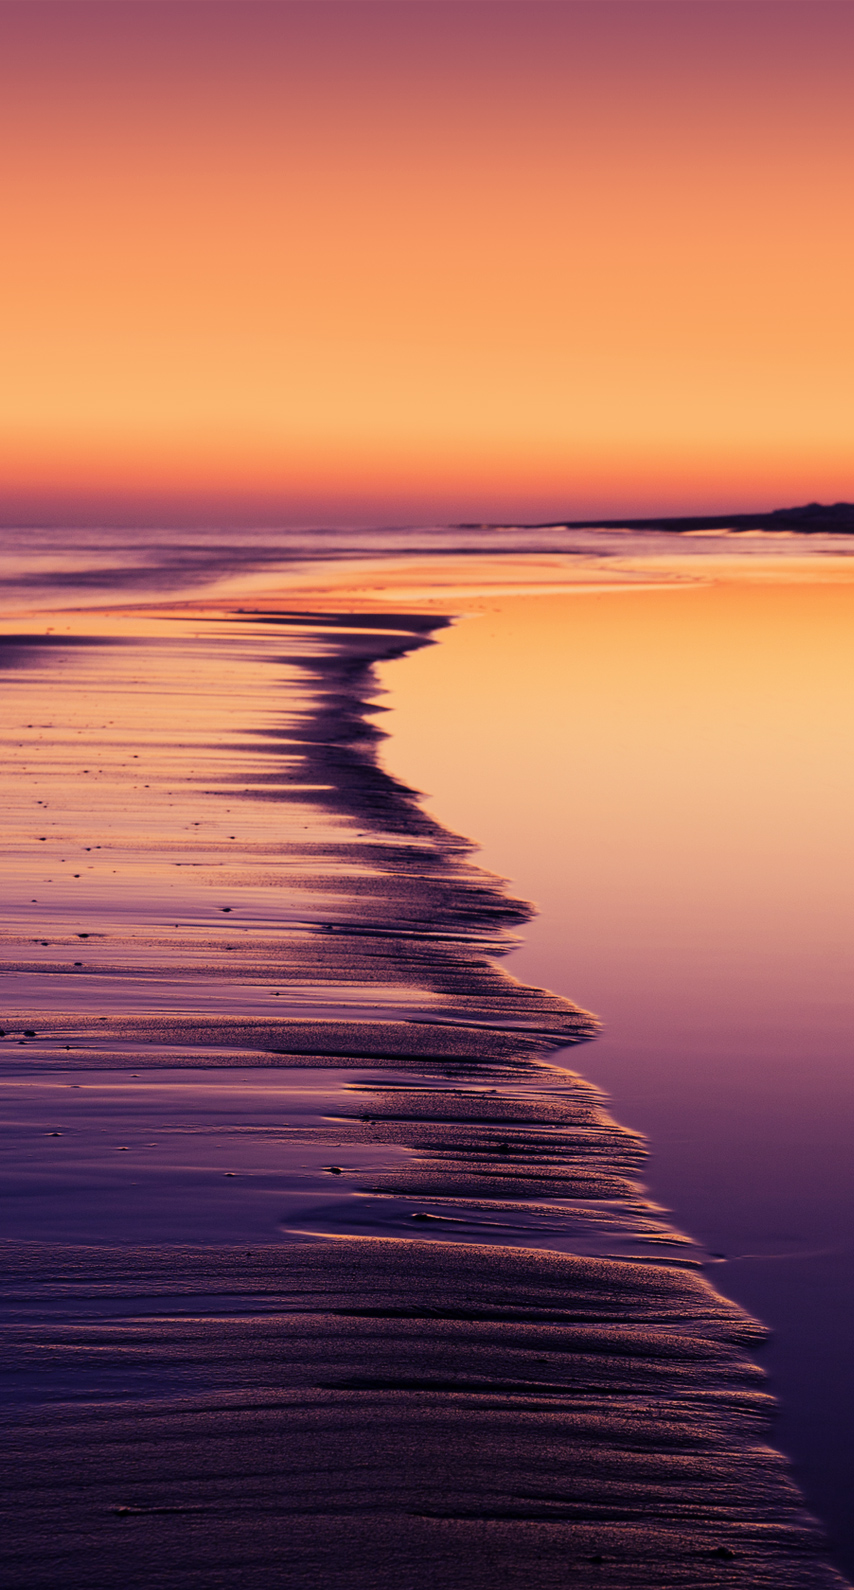 sunrise, bright, shore, summer, sand, fog, evening, sun, no person, dawn, dusk, reflection, seascape, seashore